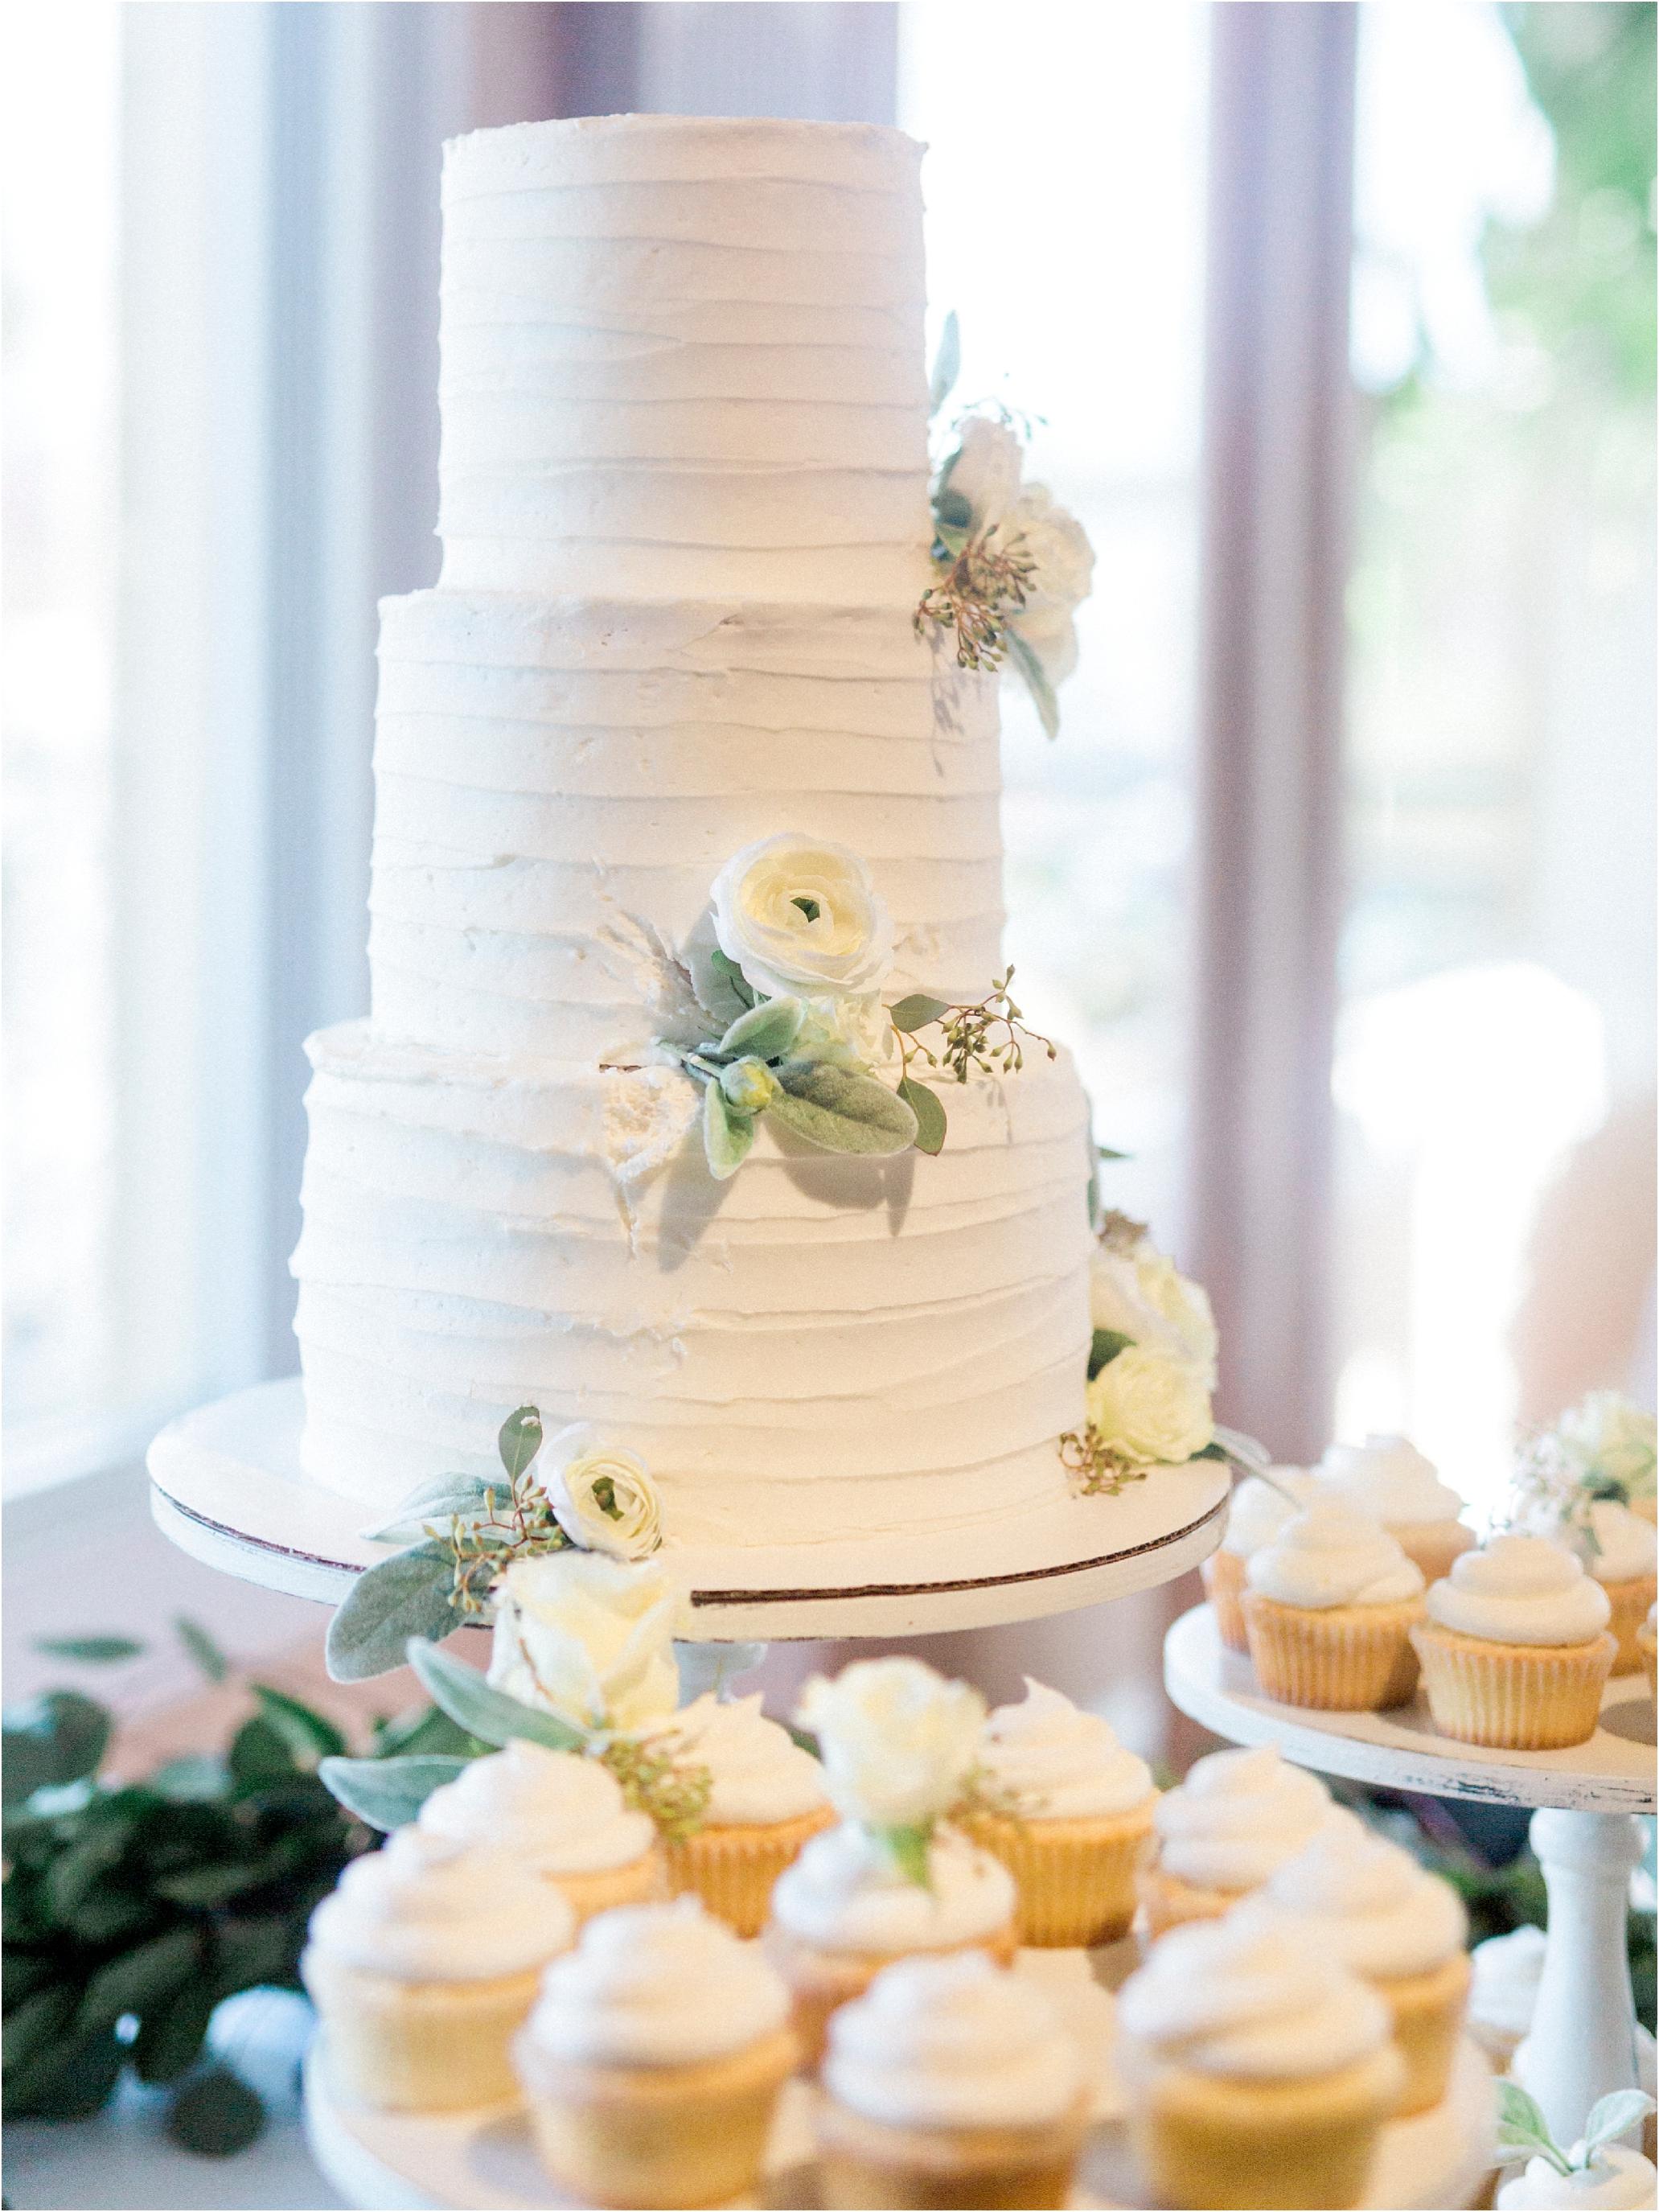 Lisa Silva Photography- Ponte Vedra Beach and Jacksonville, Florida Fine Art Film Wedding Photography- Wedding at The White Room Villa Blanca in St. Augustine, Florida_0064.jpg